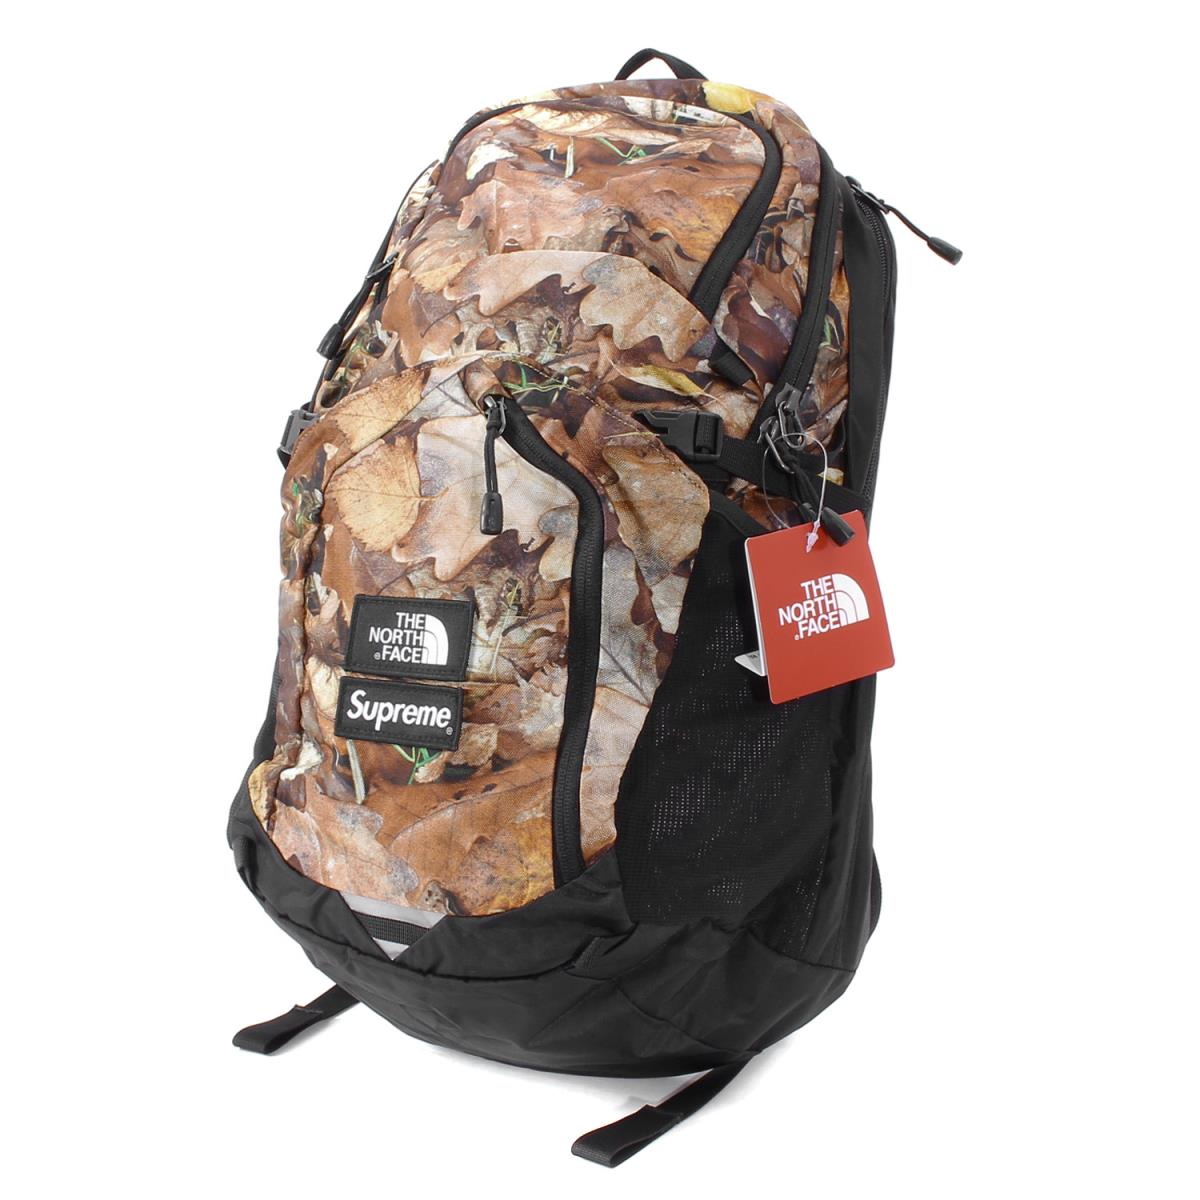 Supreme (シュプリーム) 16A/W ×THE NORTH FACE リーフカモバックパック(Leaves Pocono Backpack) リーフハンティングカモ 【メンズ】【K2047】【あす楽☆対応可】